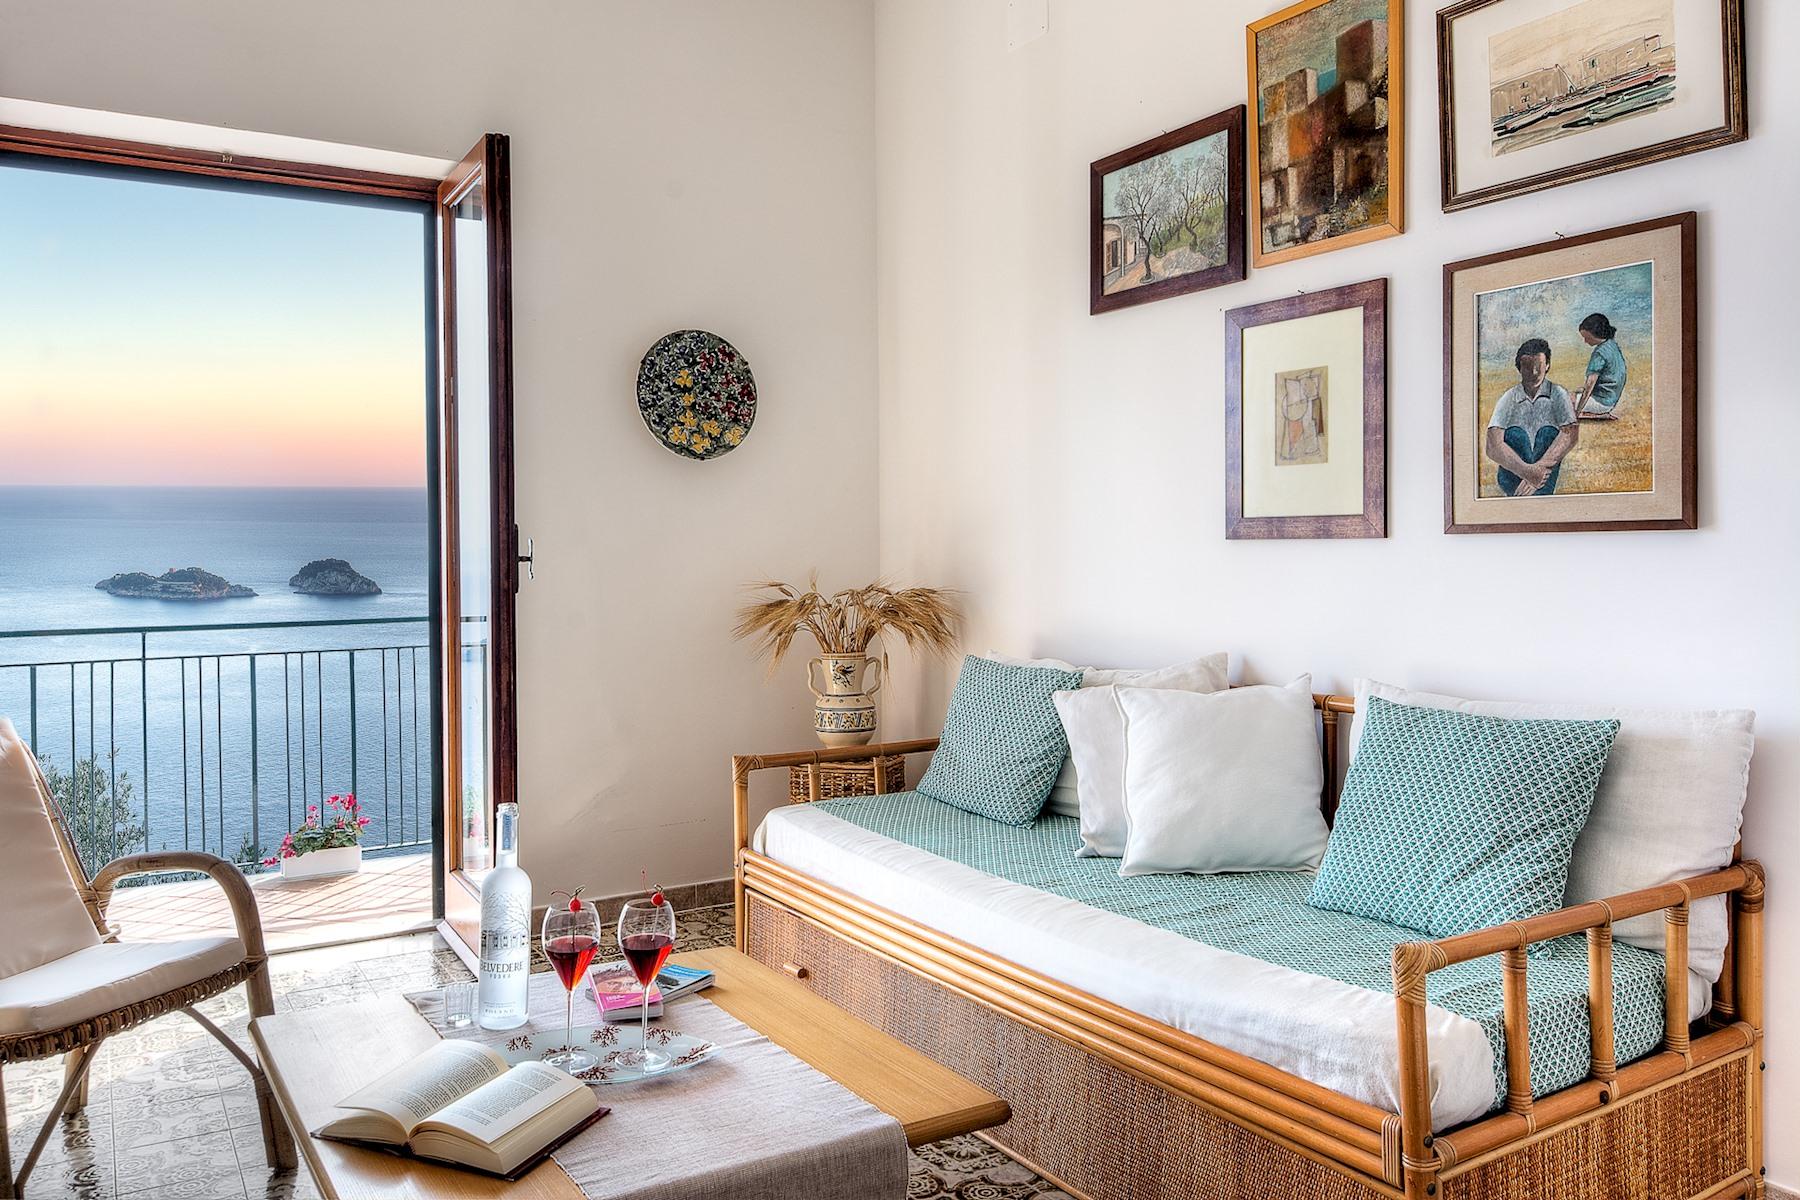 Apartment Casa Elisa - Spectaular Views to the Amalfi Coast photo 20001364